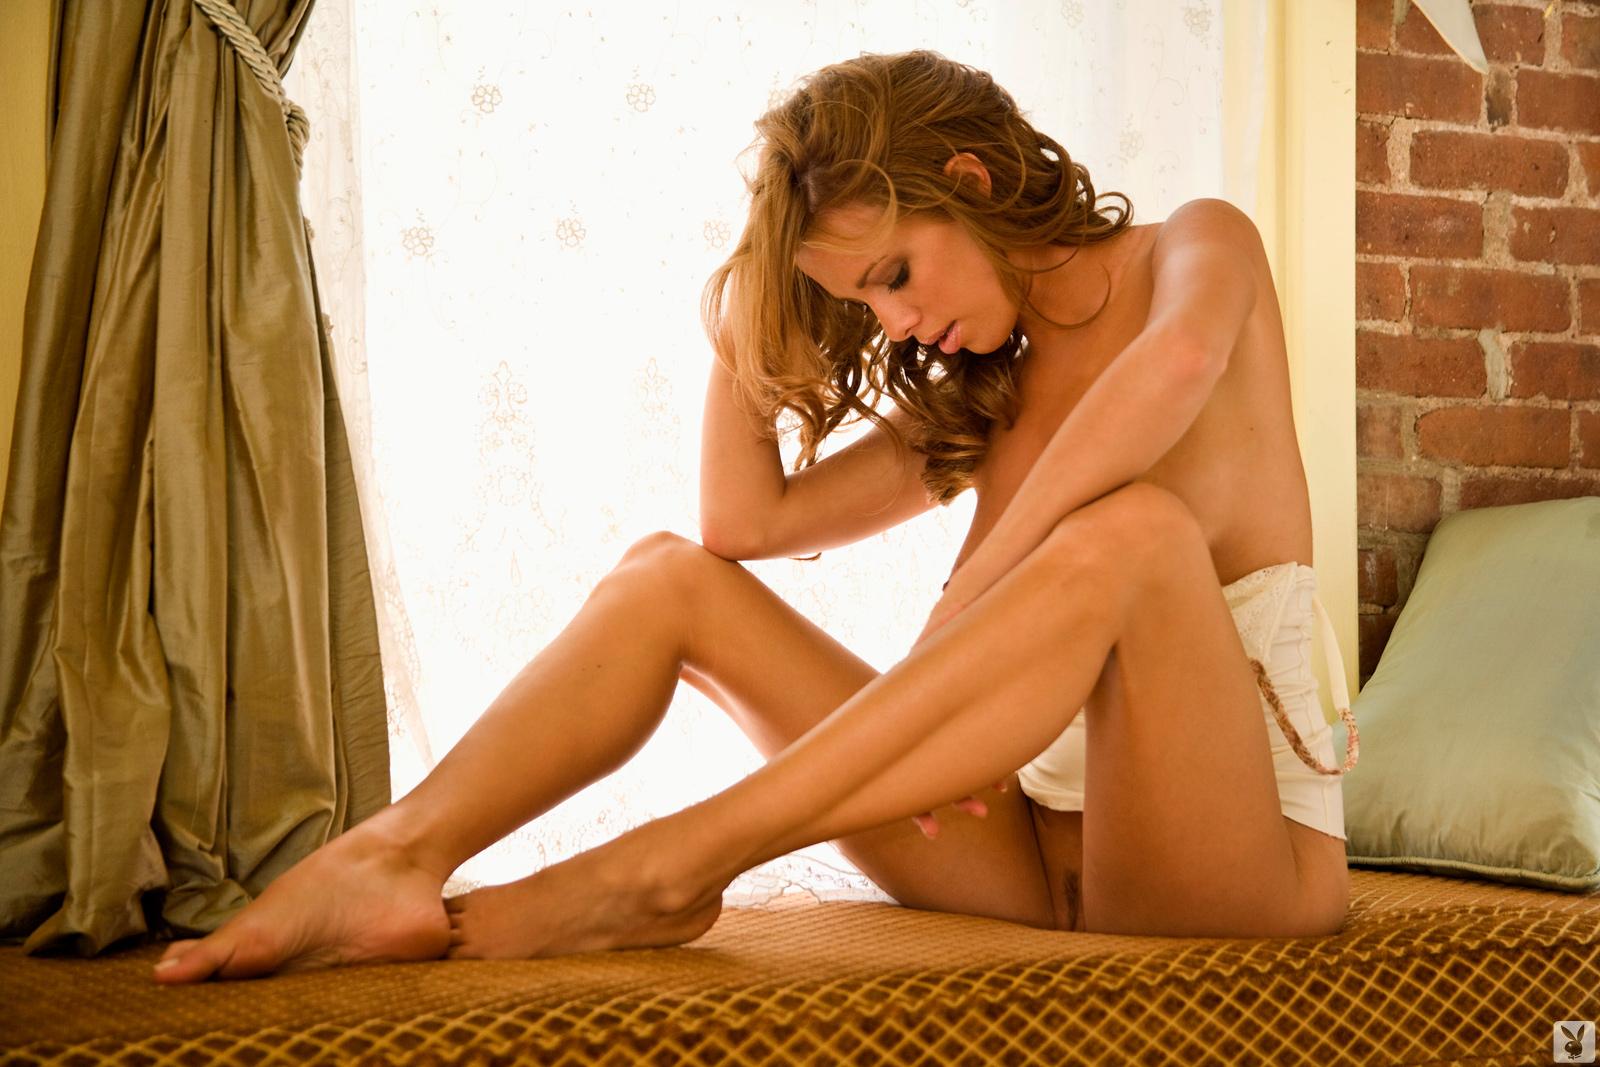 Erotic fiction lost bet